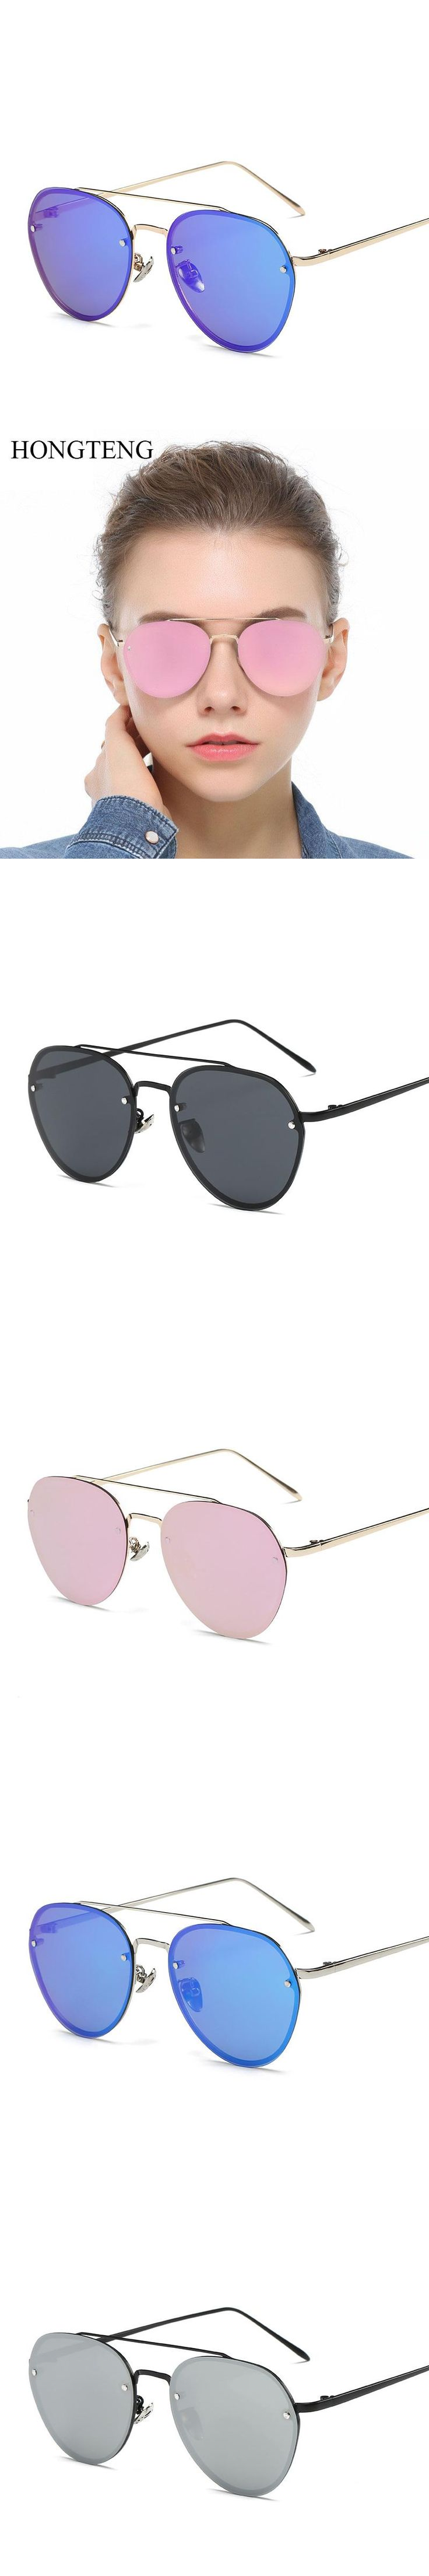 HONGTENG Tech Semi Rimless Aviator Women Sunglasses Silver Mirrored Clear Visibility Polarized Lens Men's Cool Driving Glasses